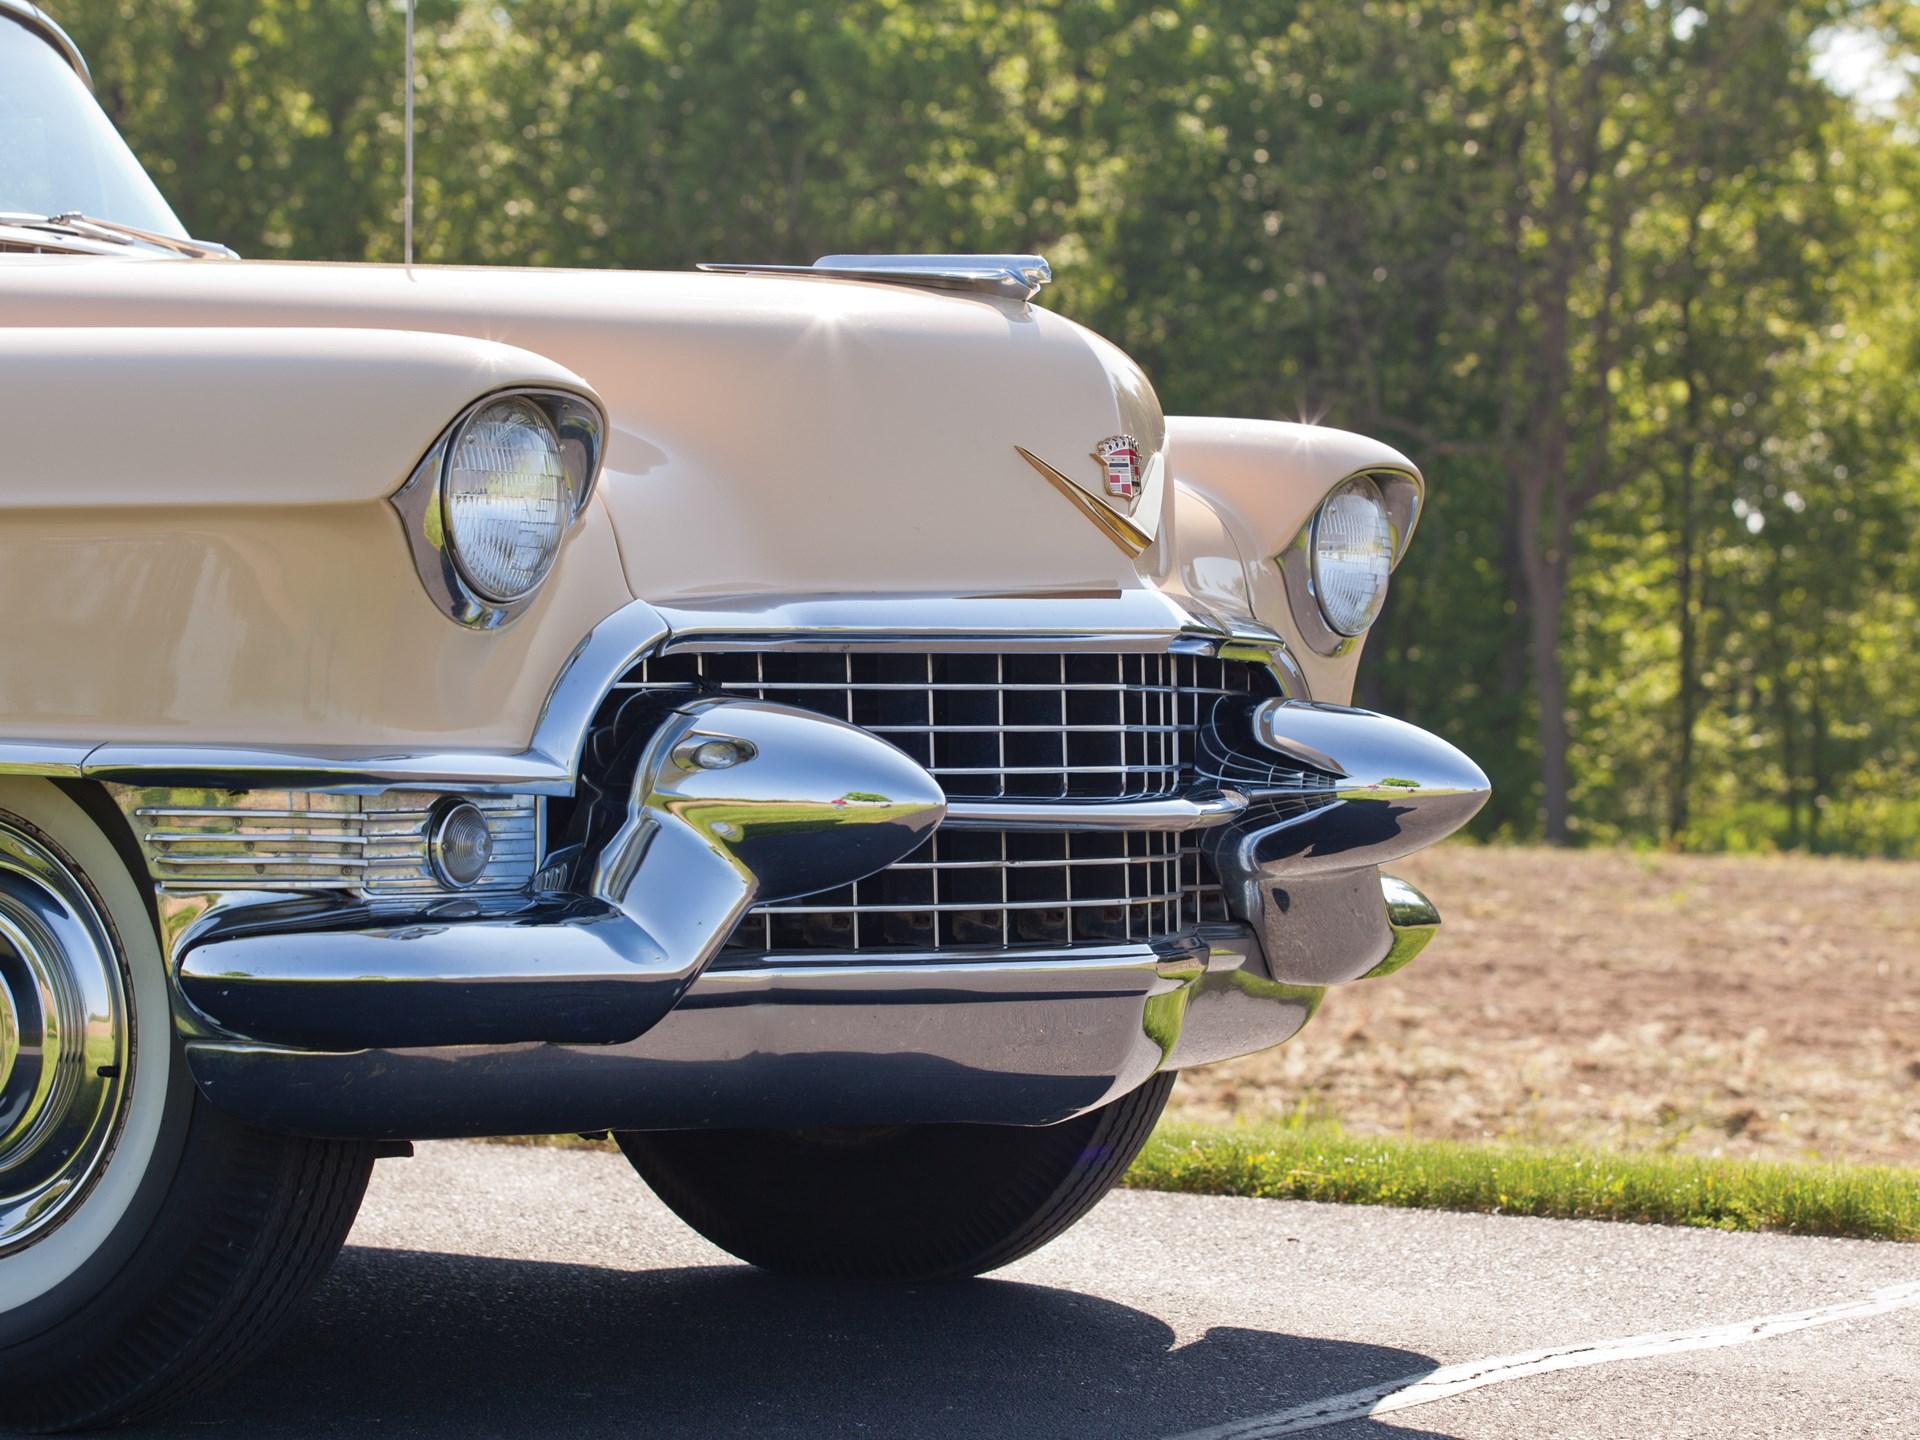 Rm Sothebys 1955 Cadillac Series 62 Coupe De Ville Motor City 2016 Deville Convertible